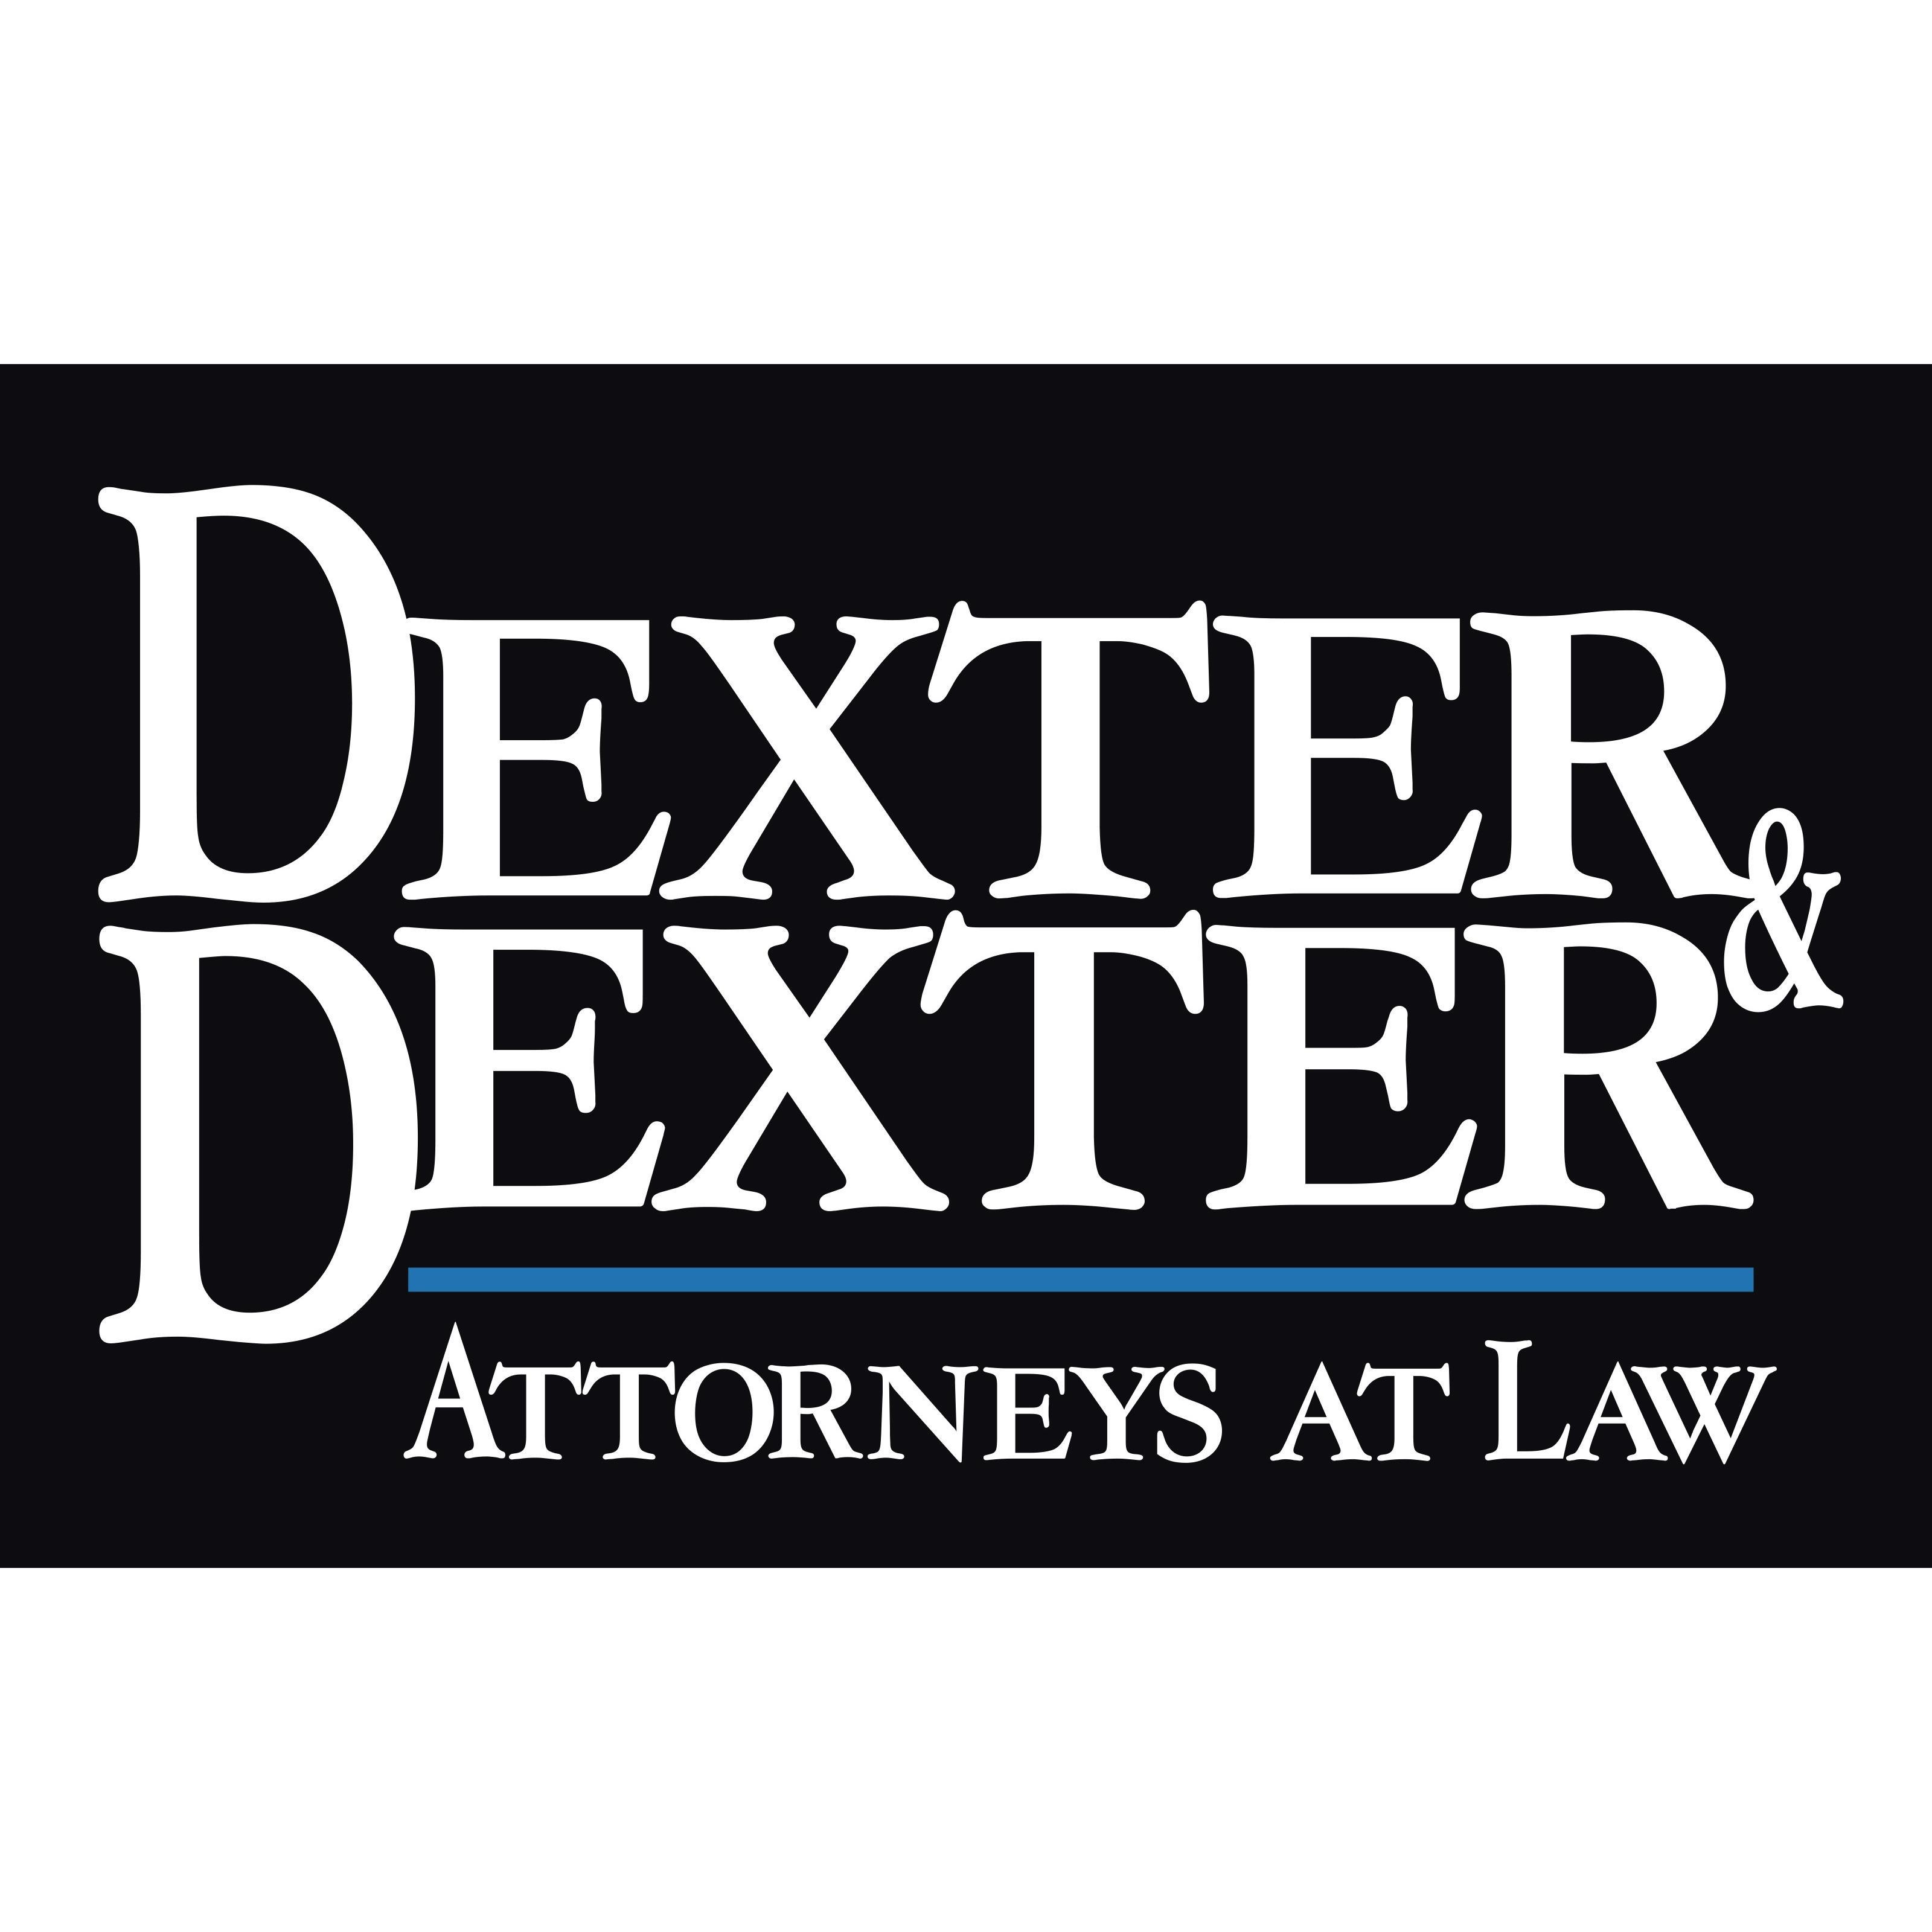 Dexter & Dexter Attorneys at Law